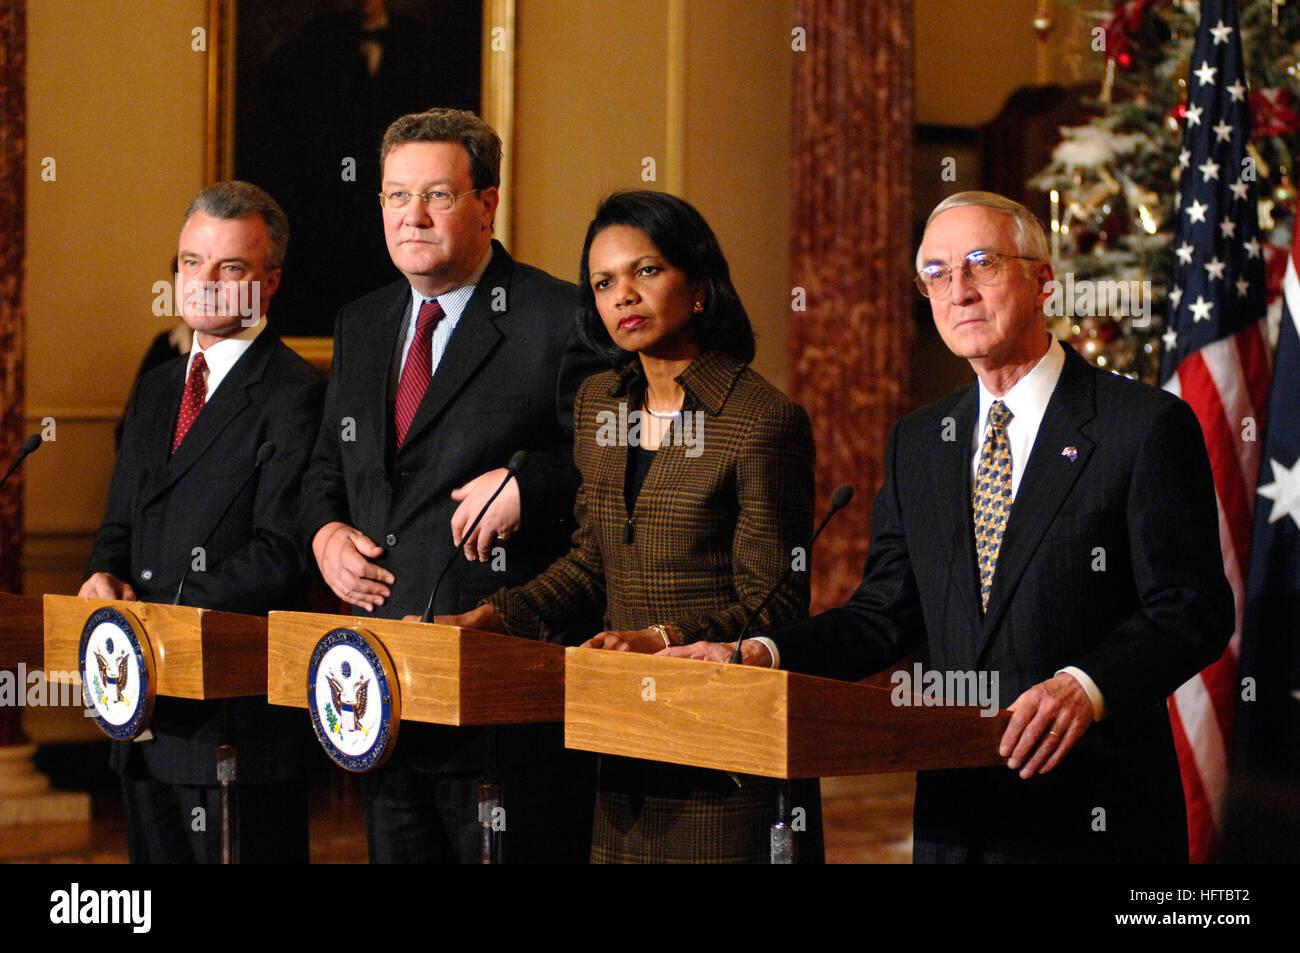 061212-N-3642E-151  Washington, D.C. (Dec. 12, 2006) - Deputy Secretary of Defense Gordon England, Secretary of - Stock Image